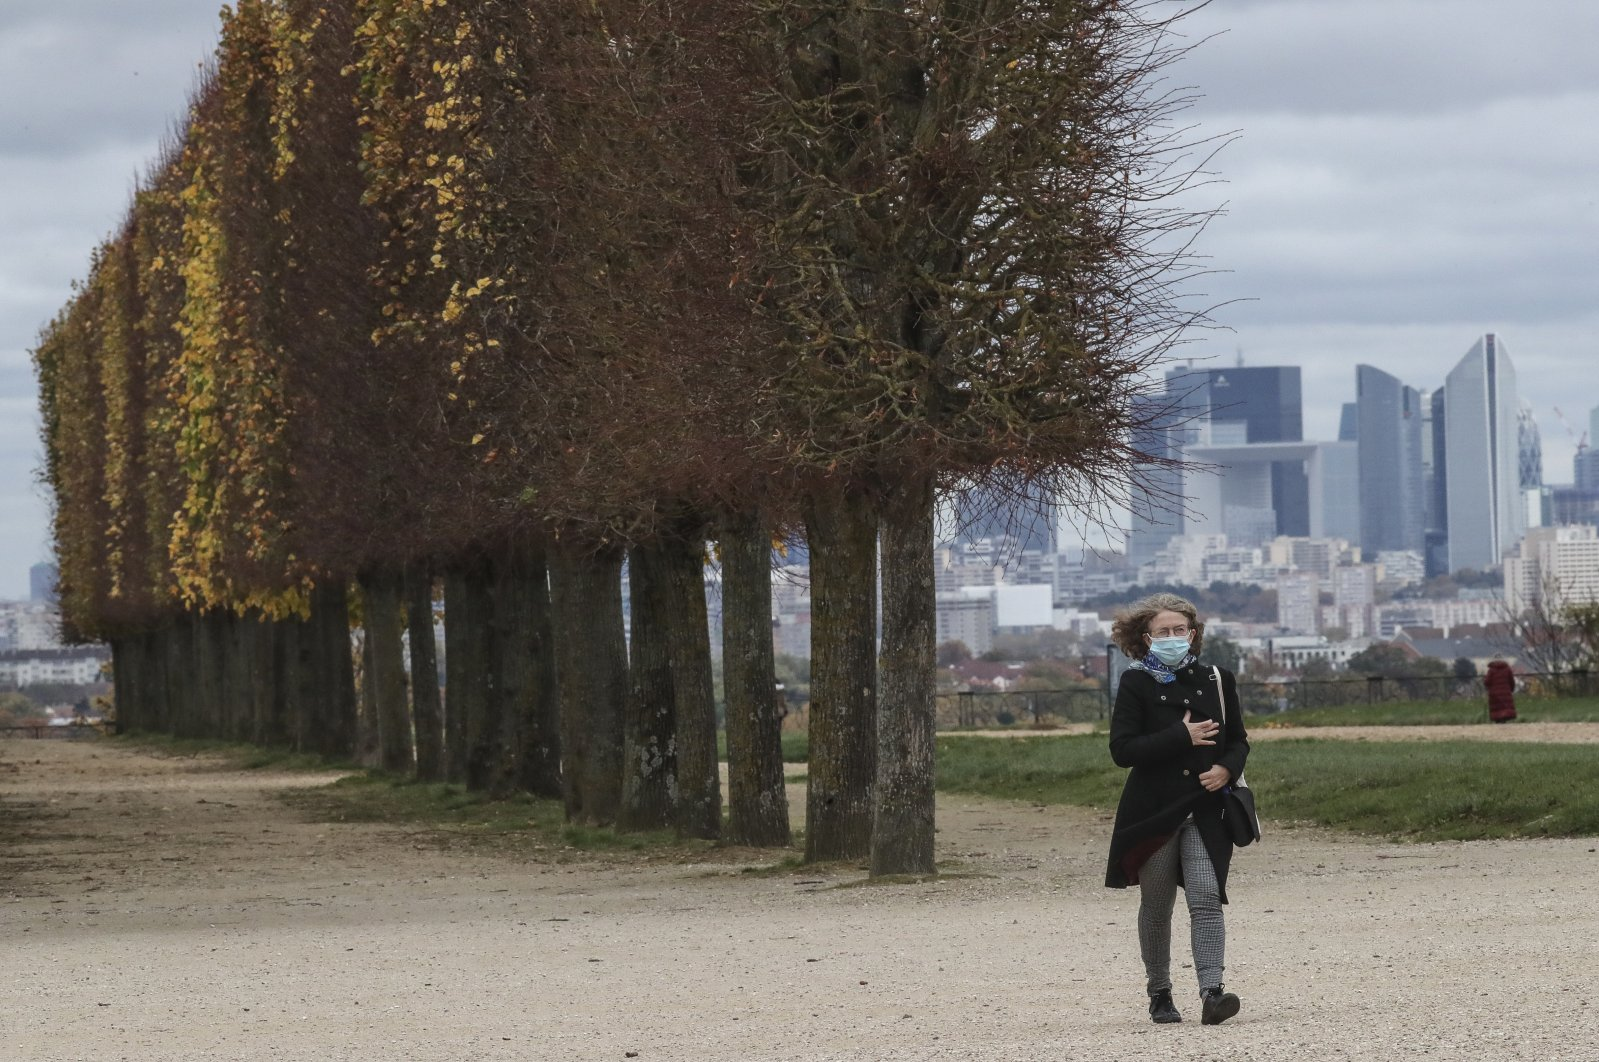 A woman wearing a mask as a precaution against the coronavirus walks through the garden of Saint-Germain-en-Laye, west of Paris, Nov. 2, 2020. (AP Photo)